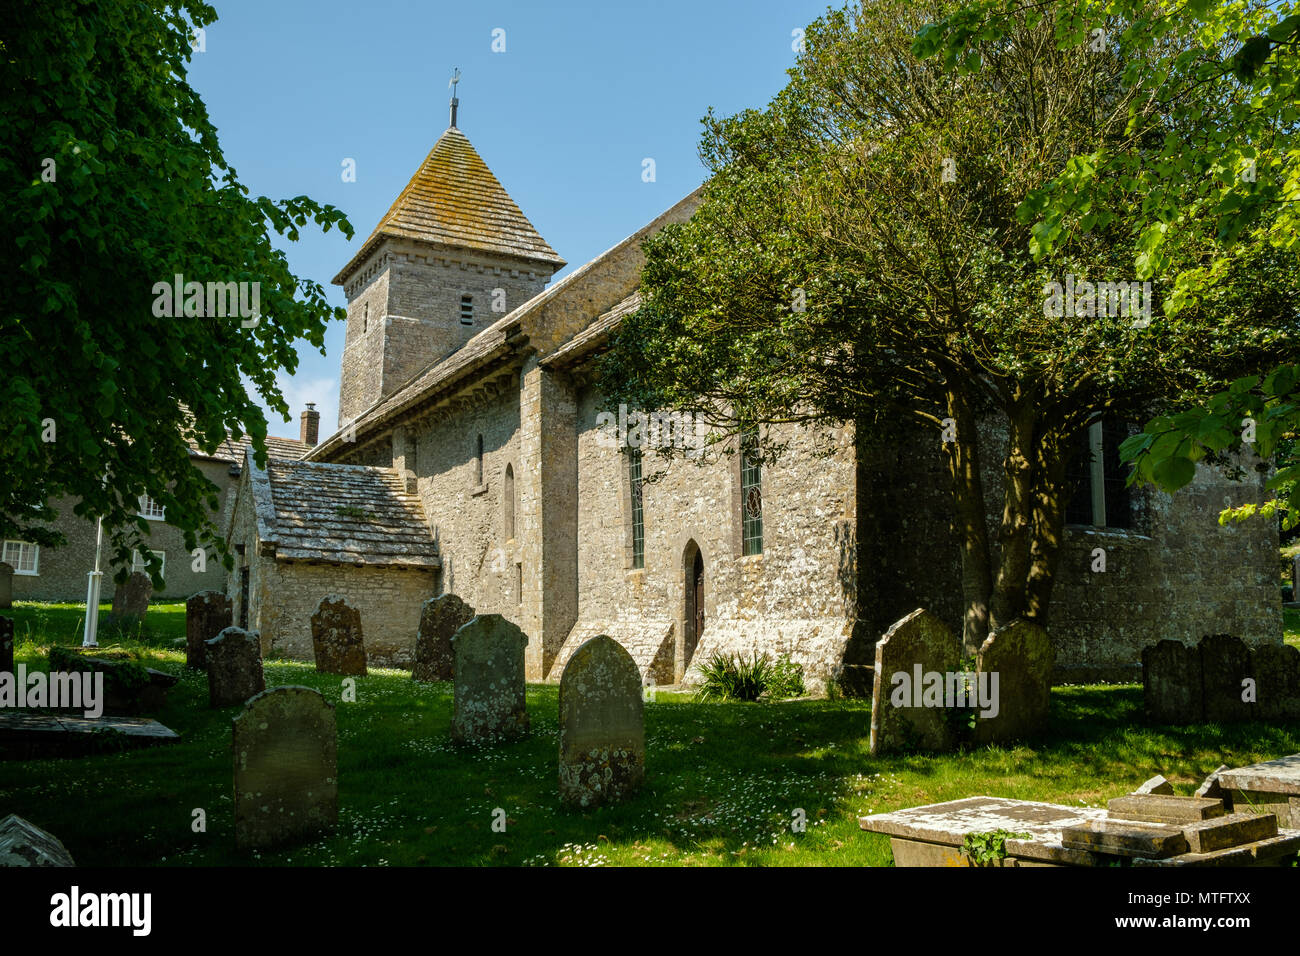 The Parish Church of St Nicholas Worth Matravers Isle of Purbeck Dorset England UK - Stock Image